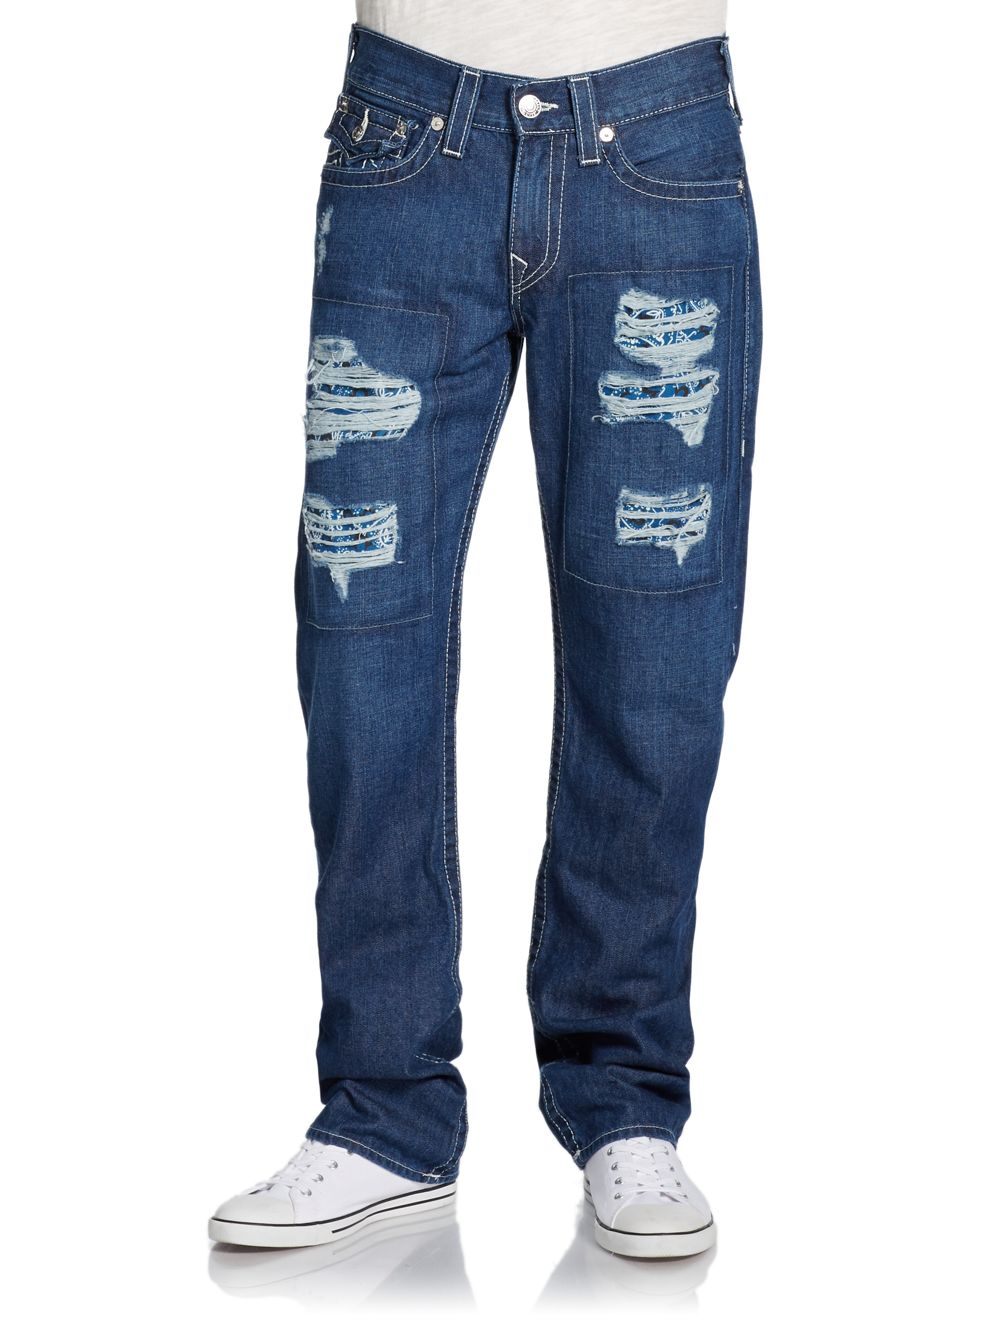 True Religion Jeans For Women Fashion